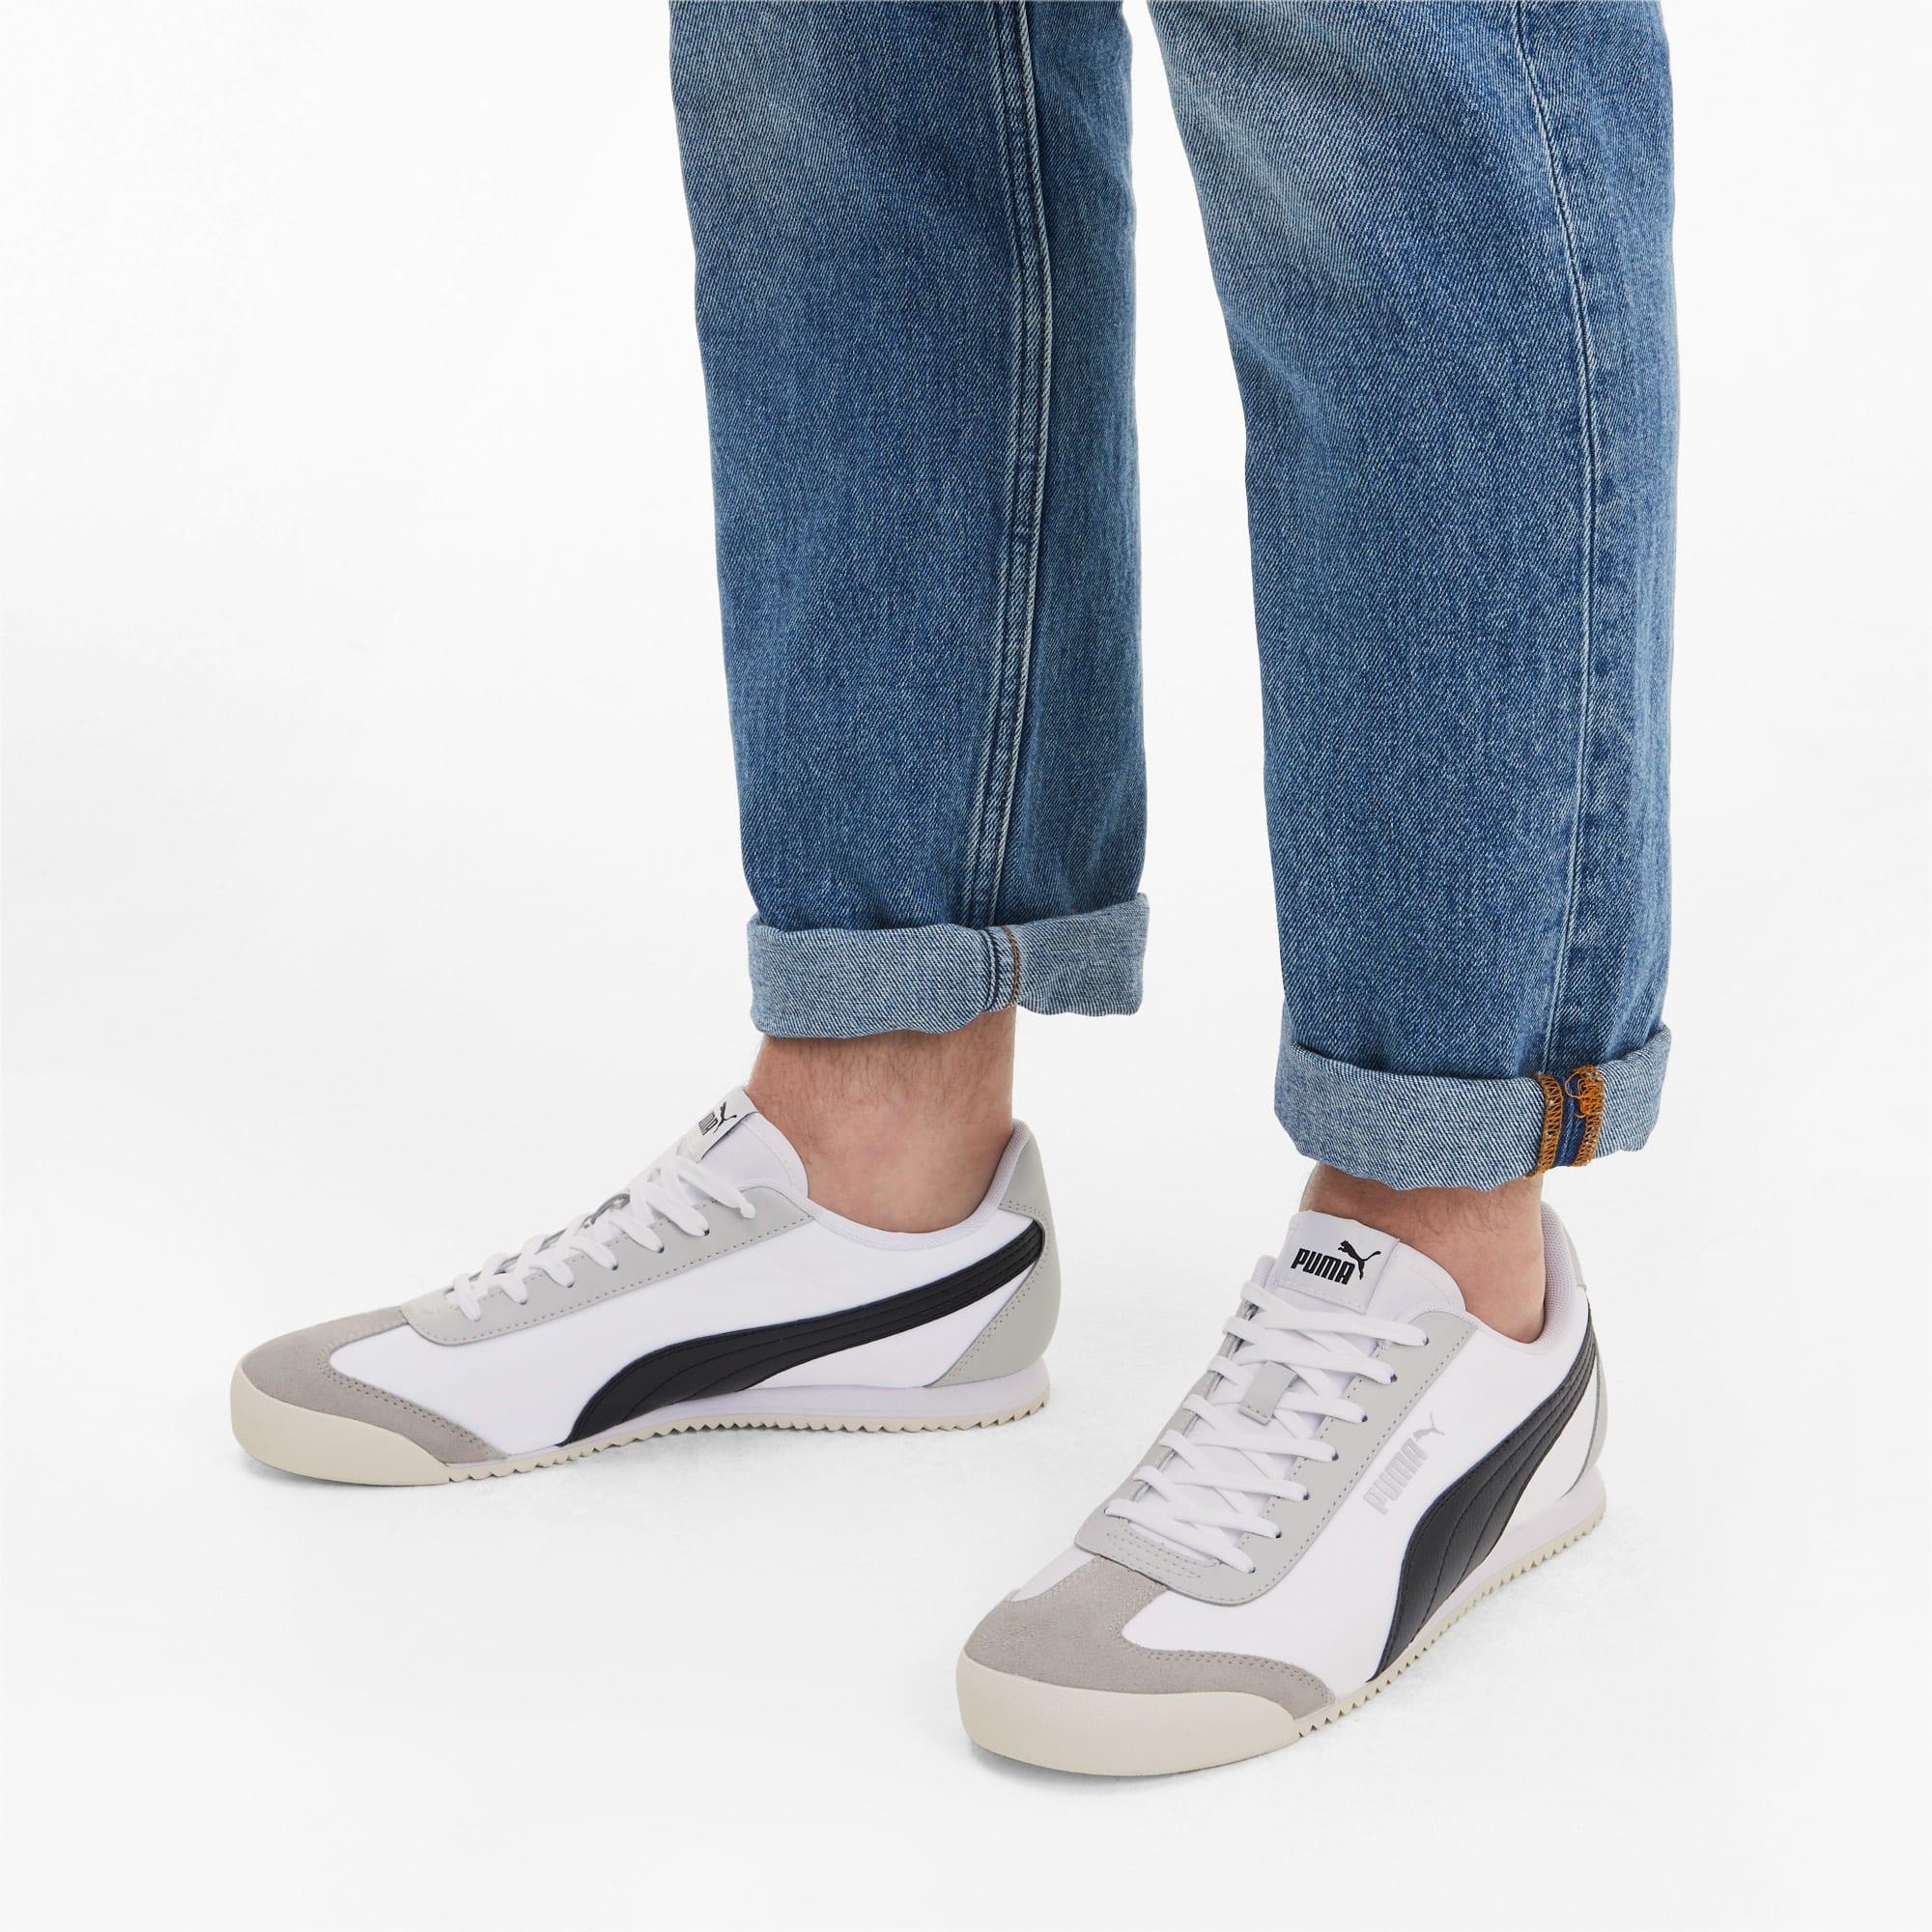 Turino NL Men's Sneakers